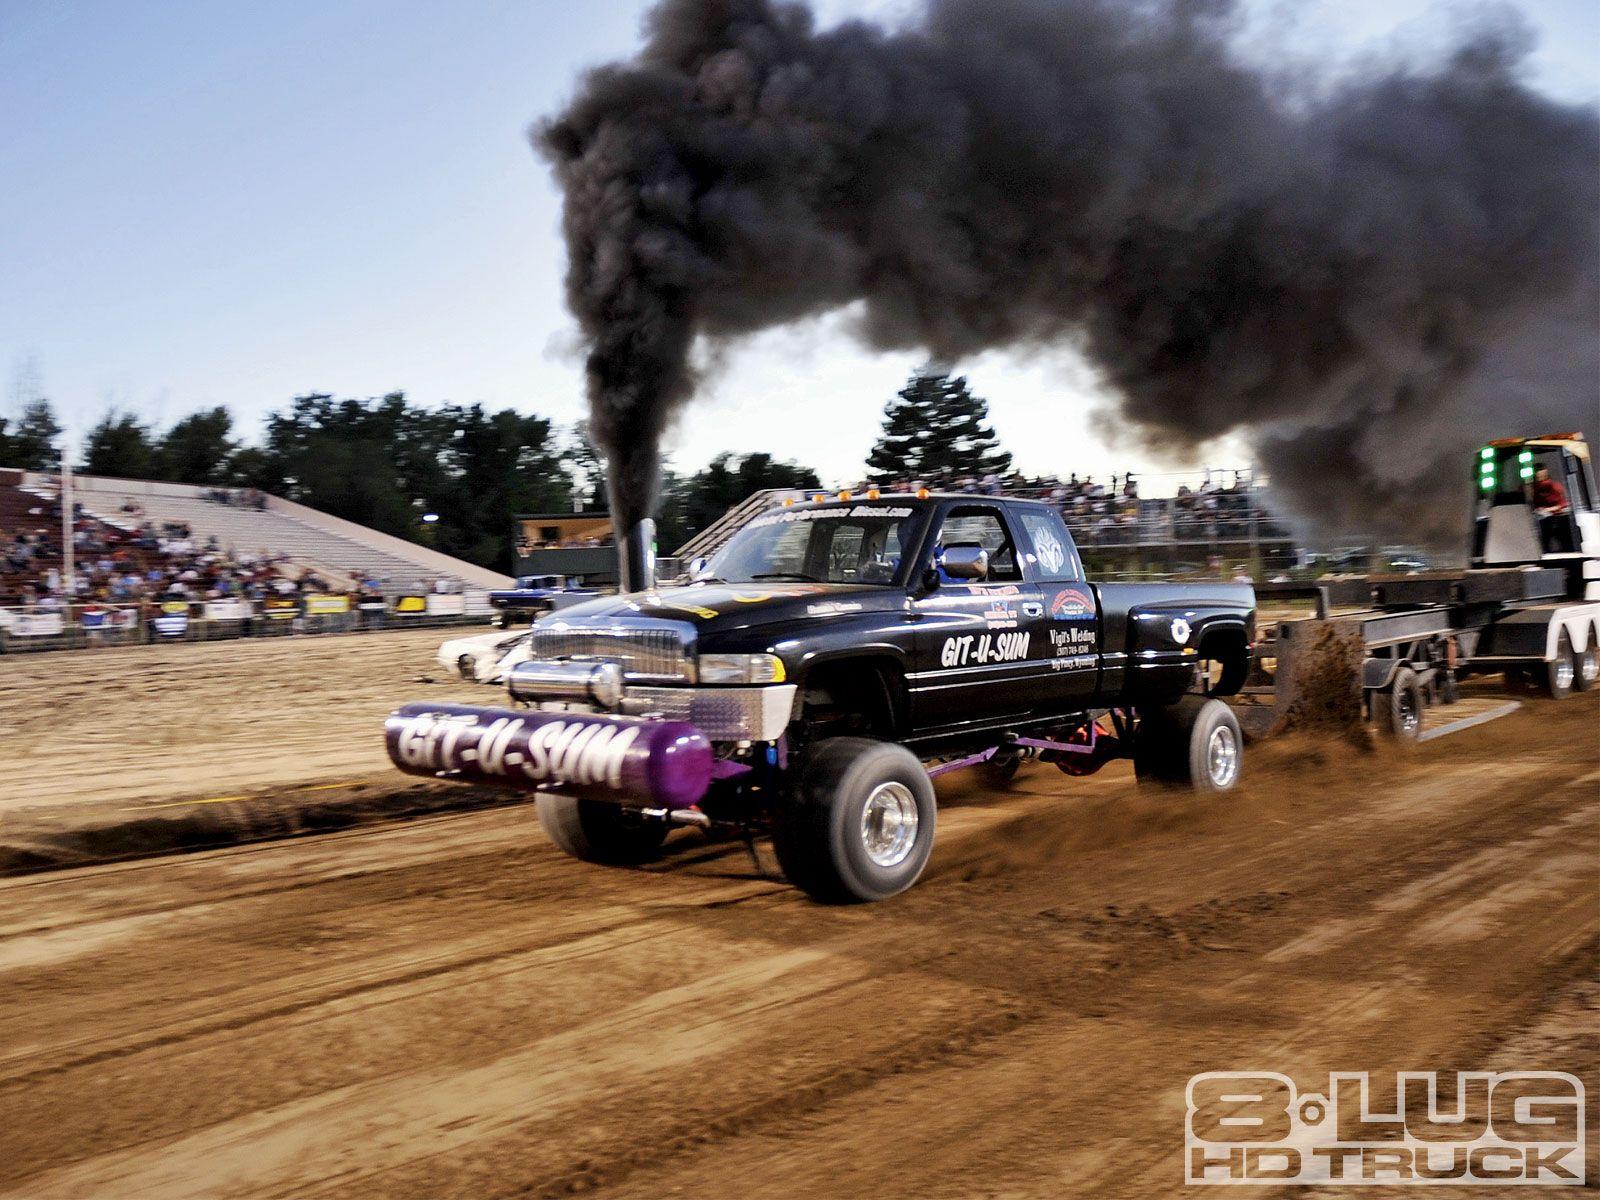 ROLLIN' COAL Truck and tractor pull, Cummins trucks